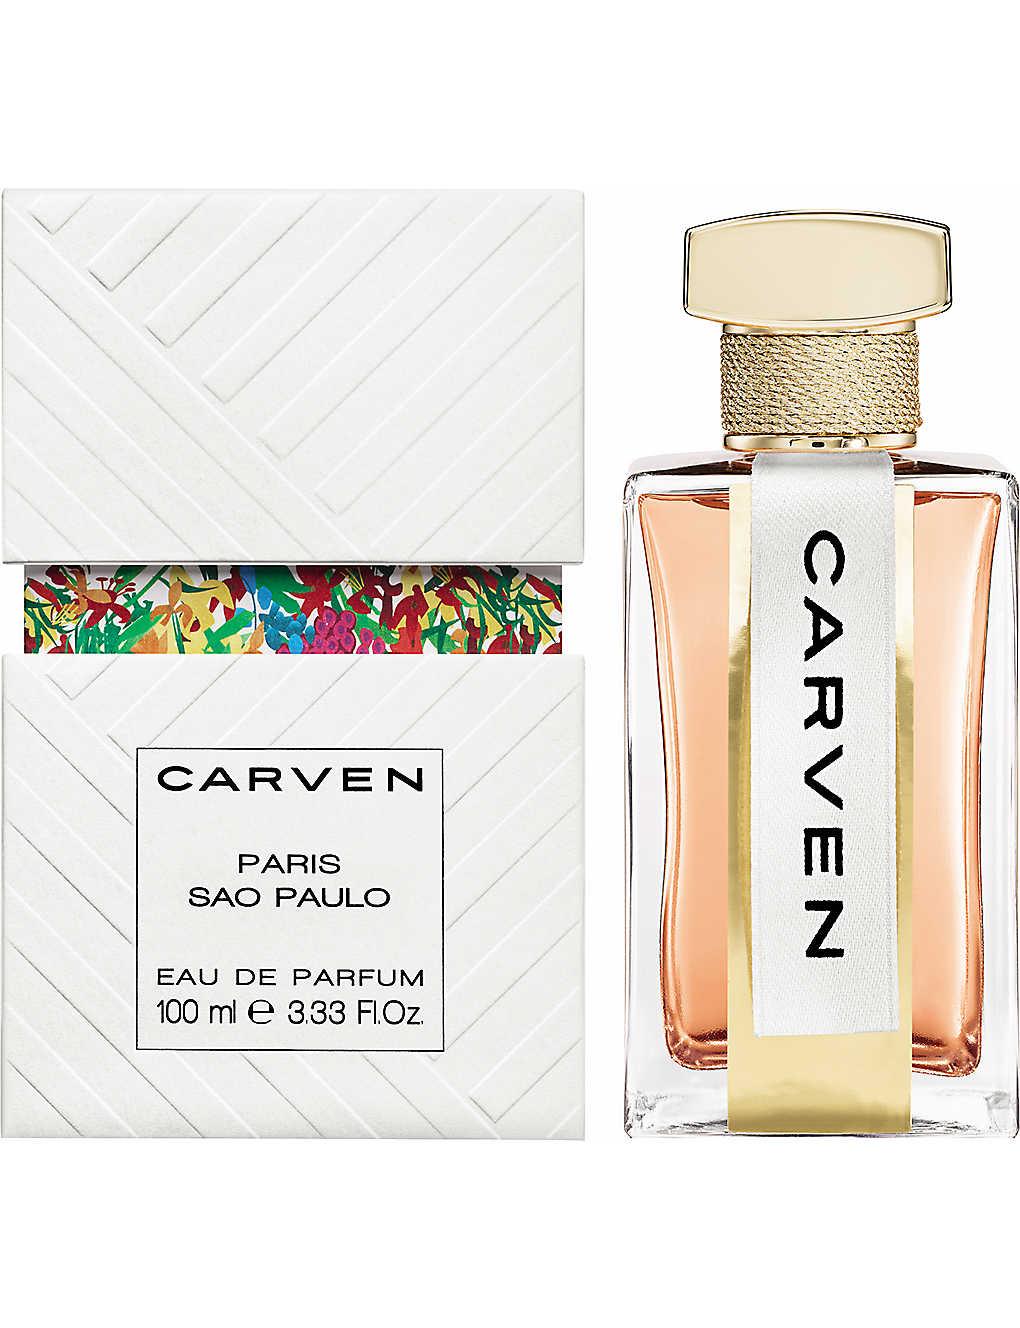 Carven Paris Sao Paulo Eau De Parfum 100ml Selfridgescom